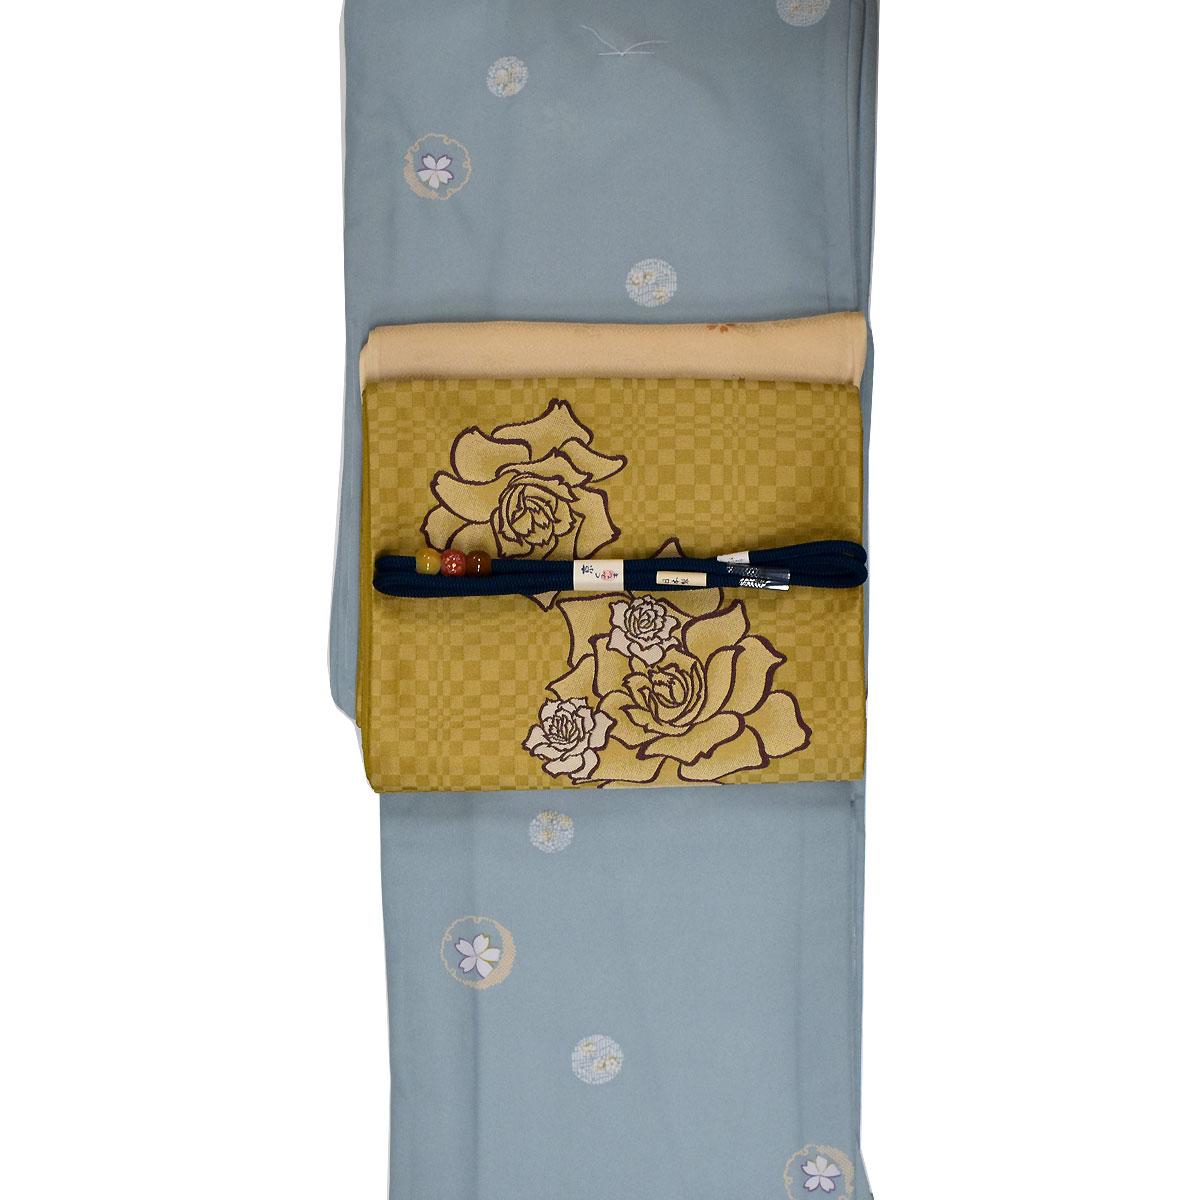 【L寸】【 単衣 】 洗える着物 セット【国産生地】【上質生地】 洗える着物 + 洗える 京袋帯 + 正絹 帯揚げ + 正絹 帯締め 番号d808-89【h805】